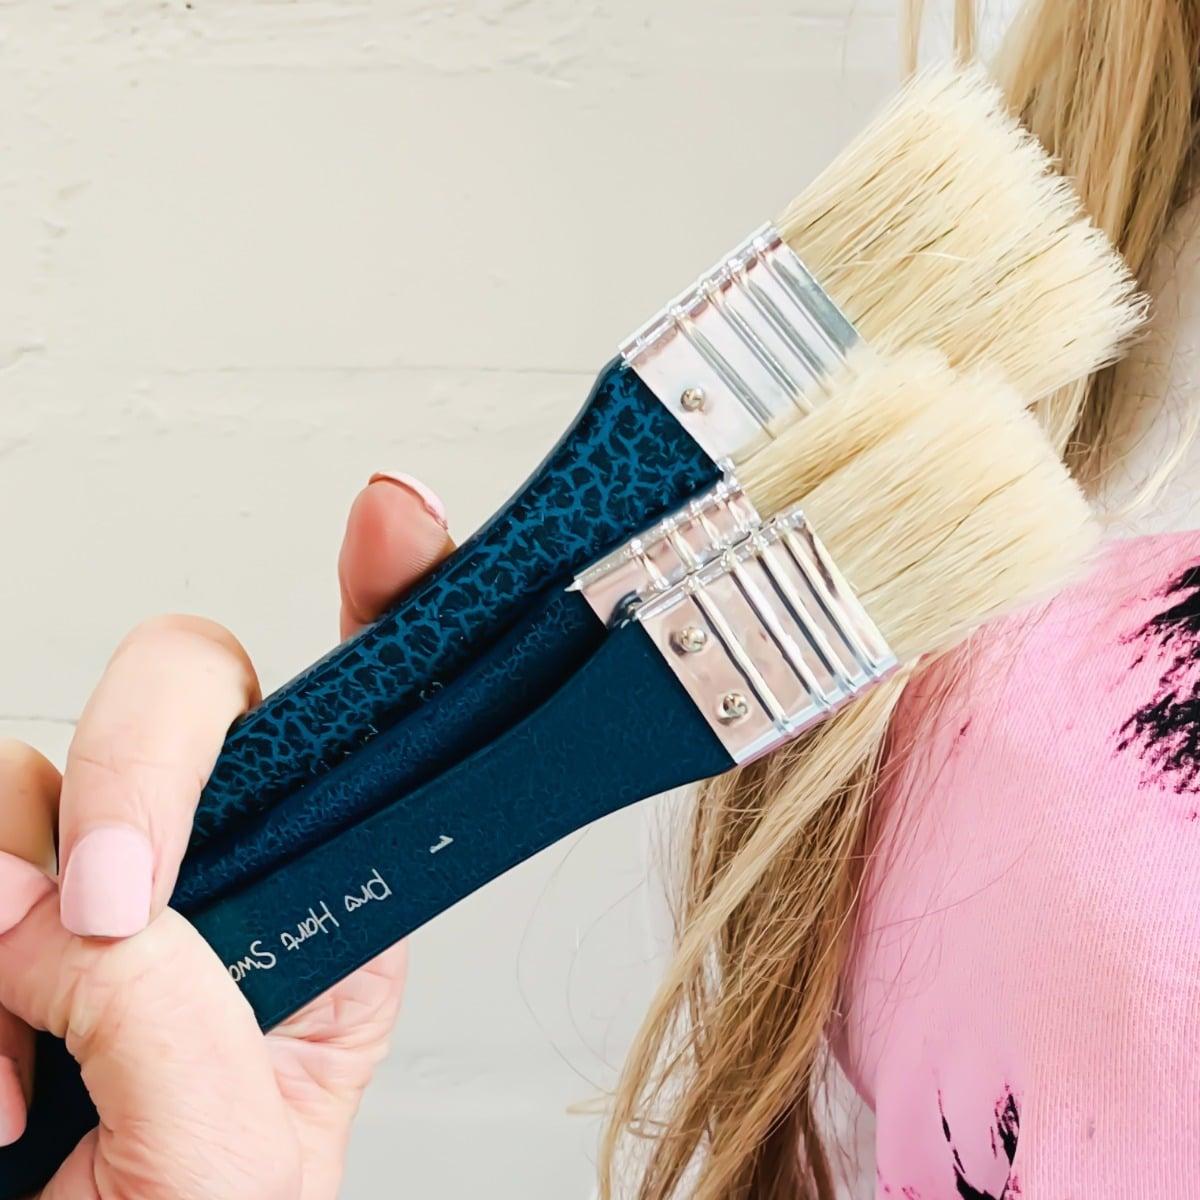 "Pro Hart Swagger Hog Hair 1"" 2"" & 3"" Hog Hair Paintbrushes"